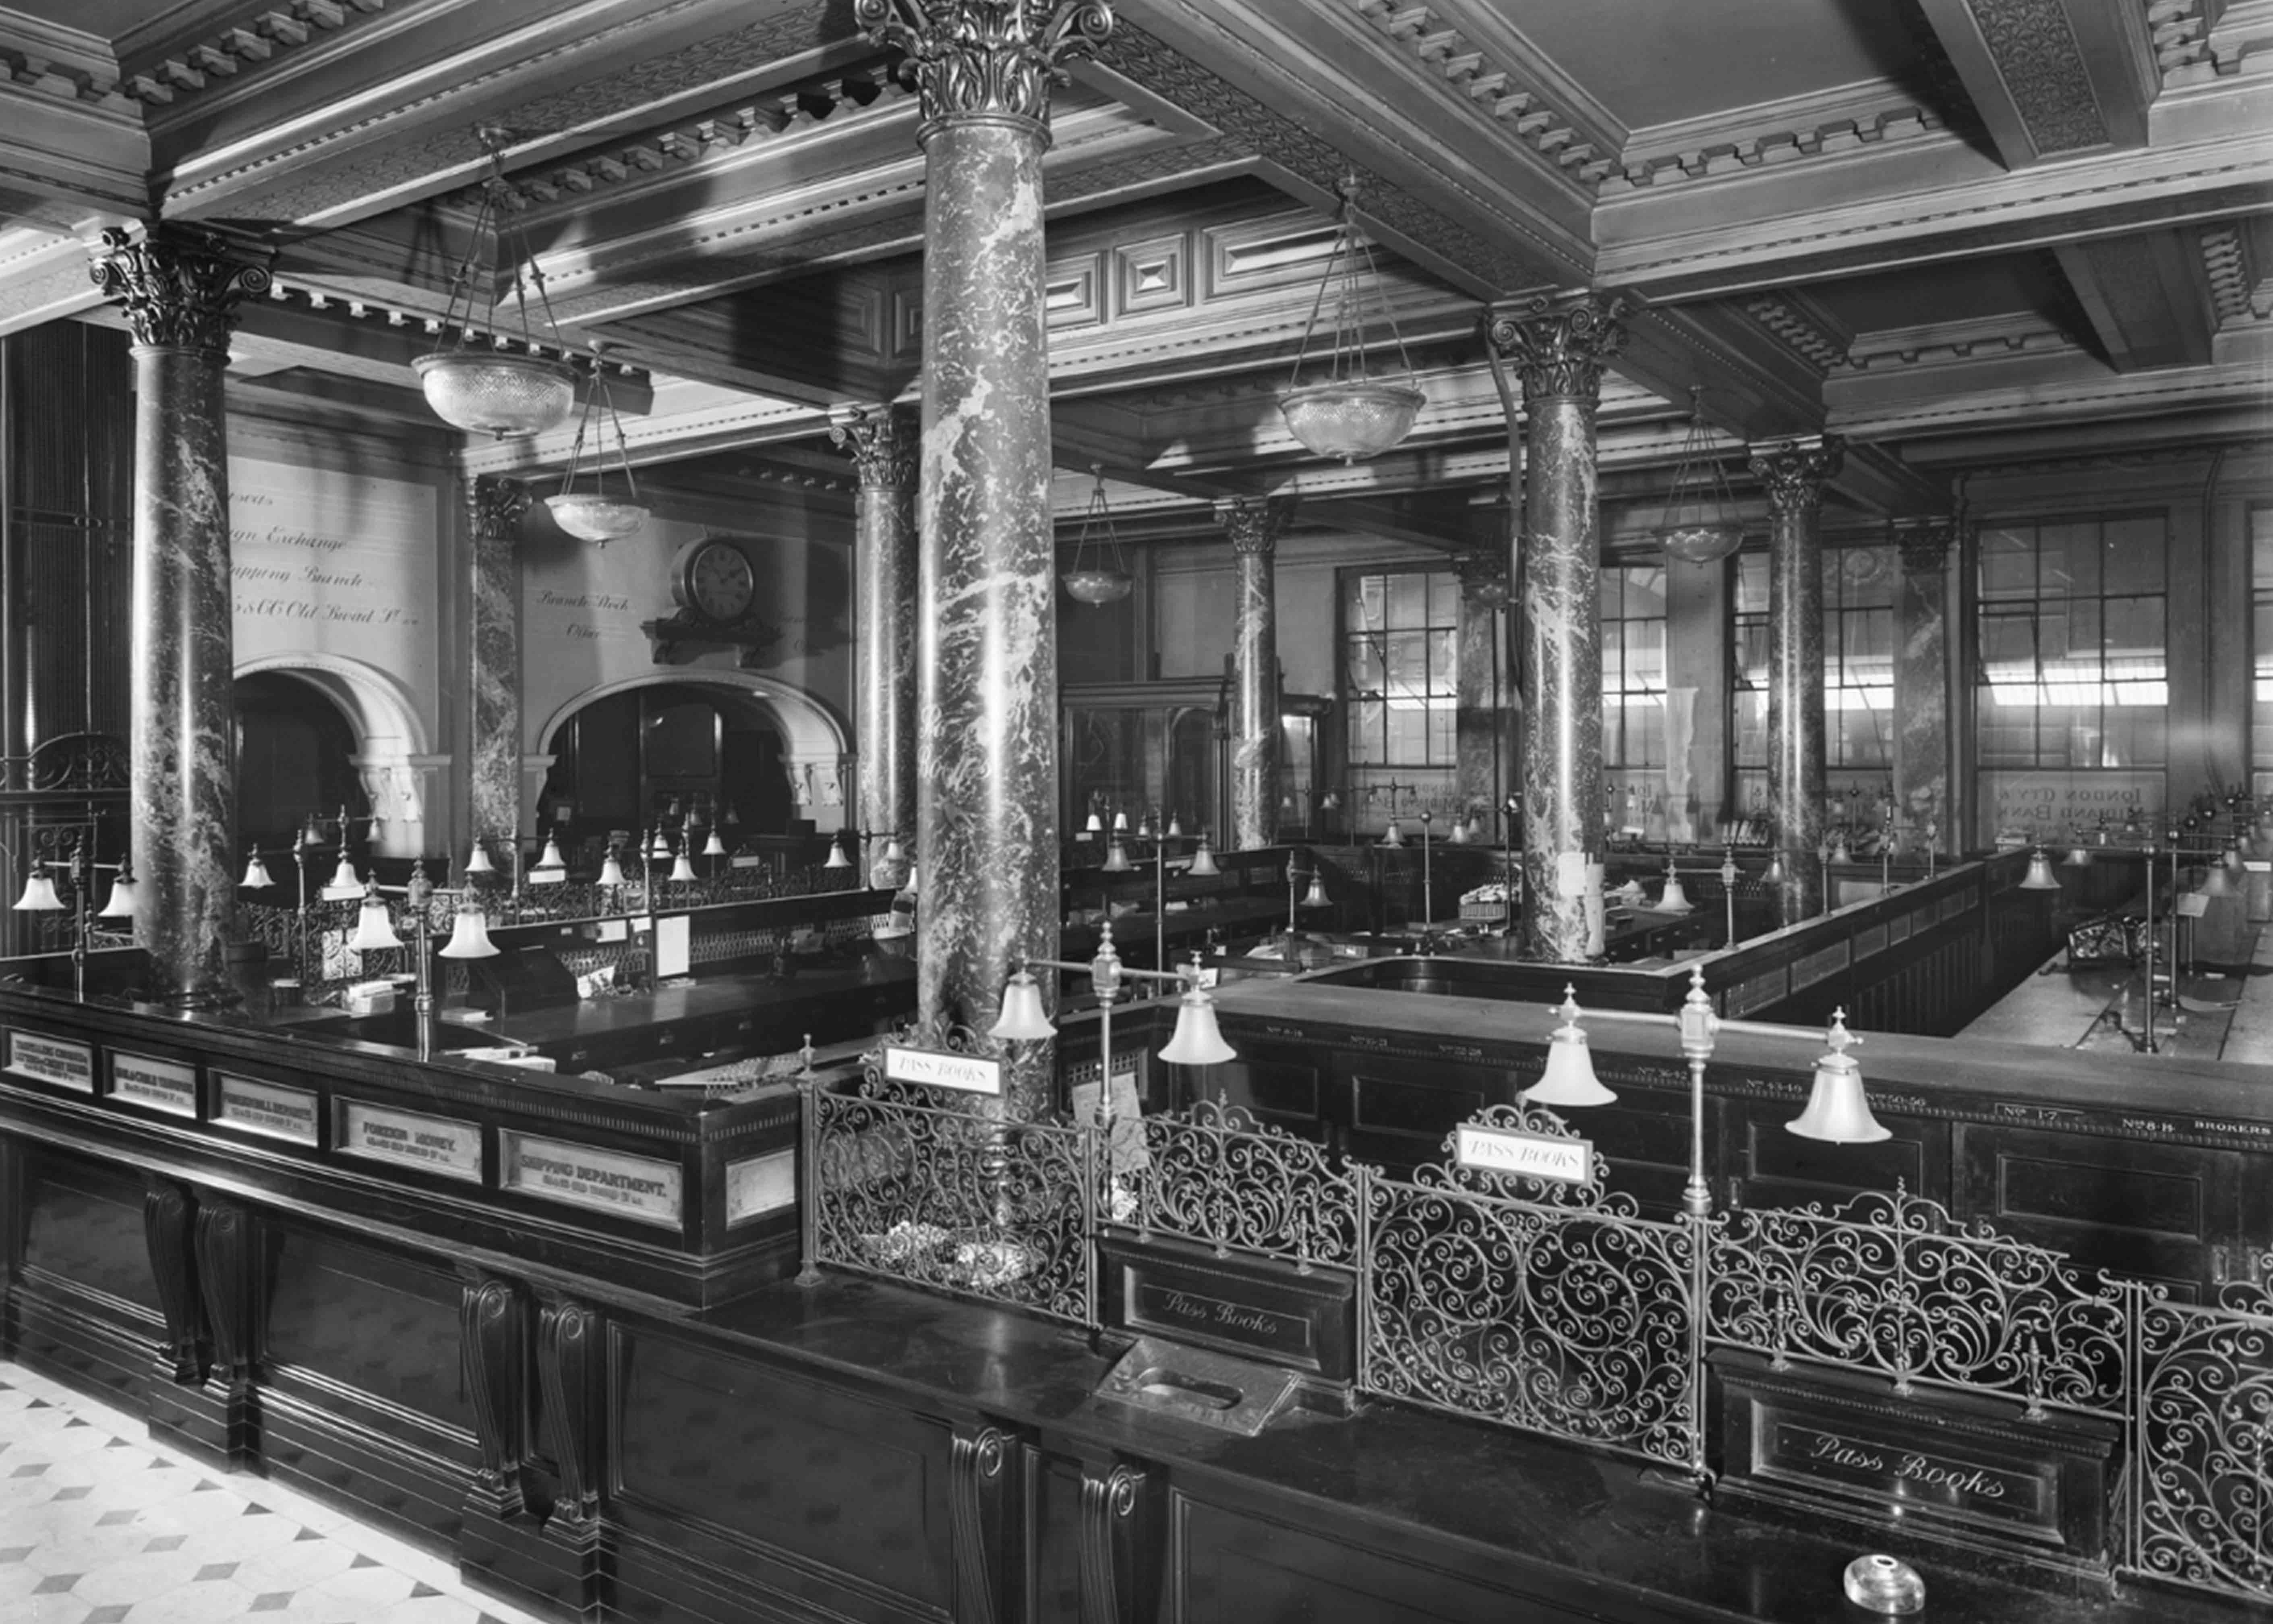 Historic image of the Midland Bank